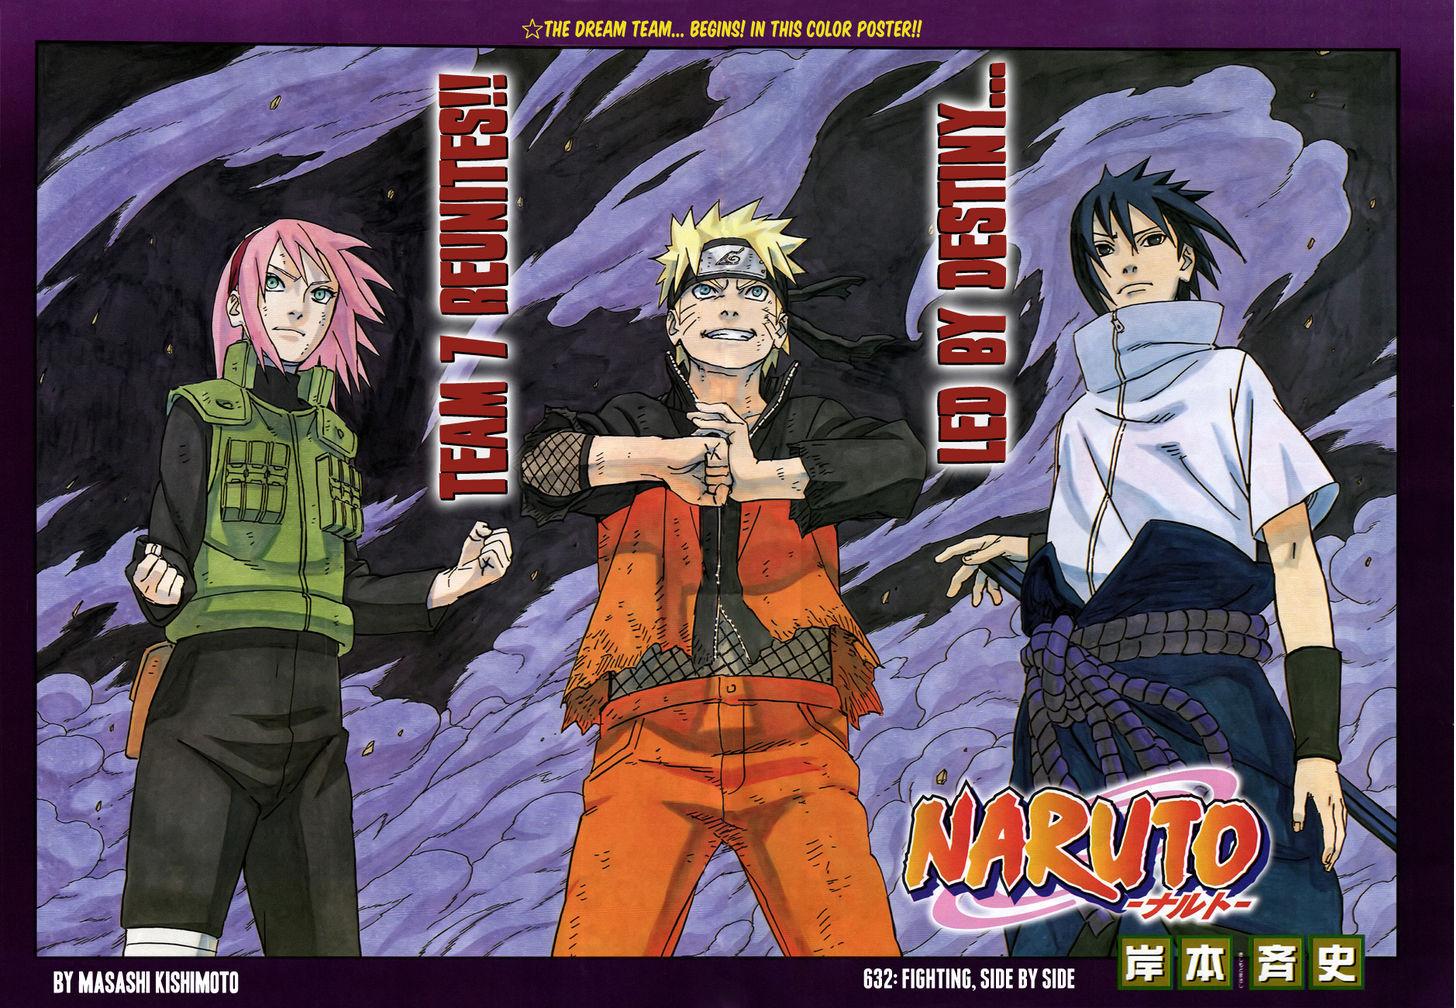 http://im.nineanime.com/comics/pic9/33/289/63953/Naruto6320490.jpg Page 1